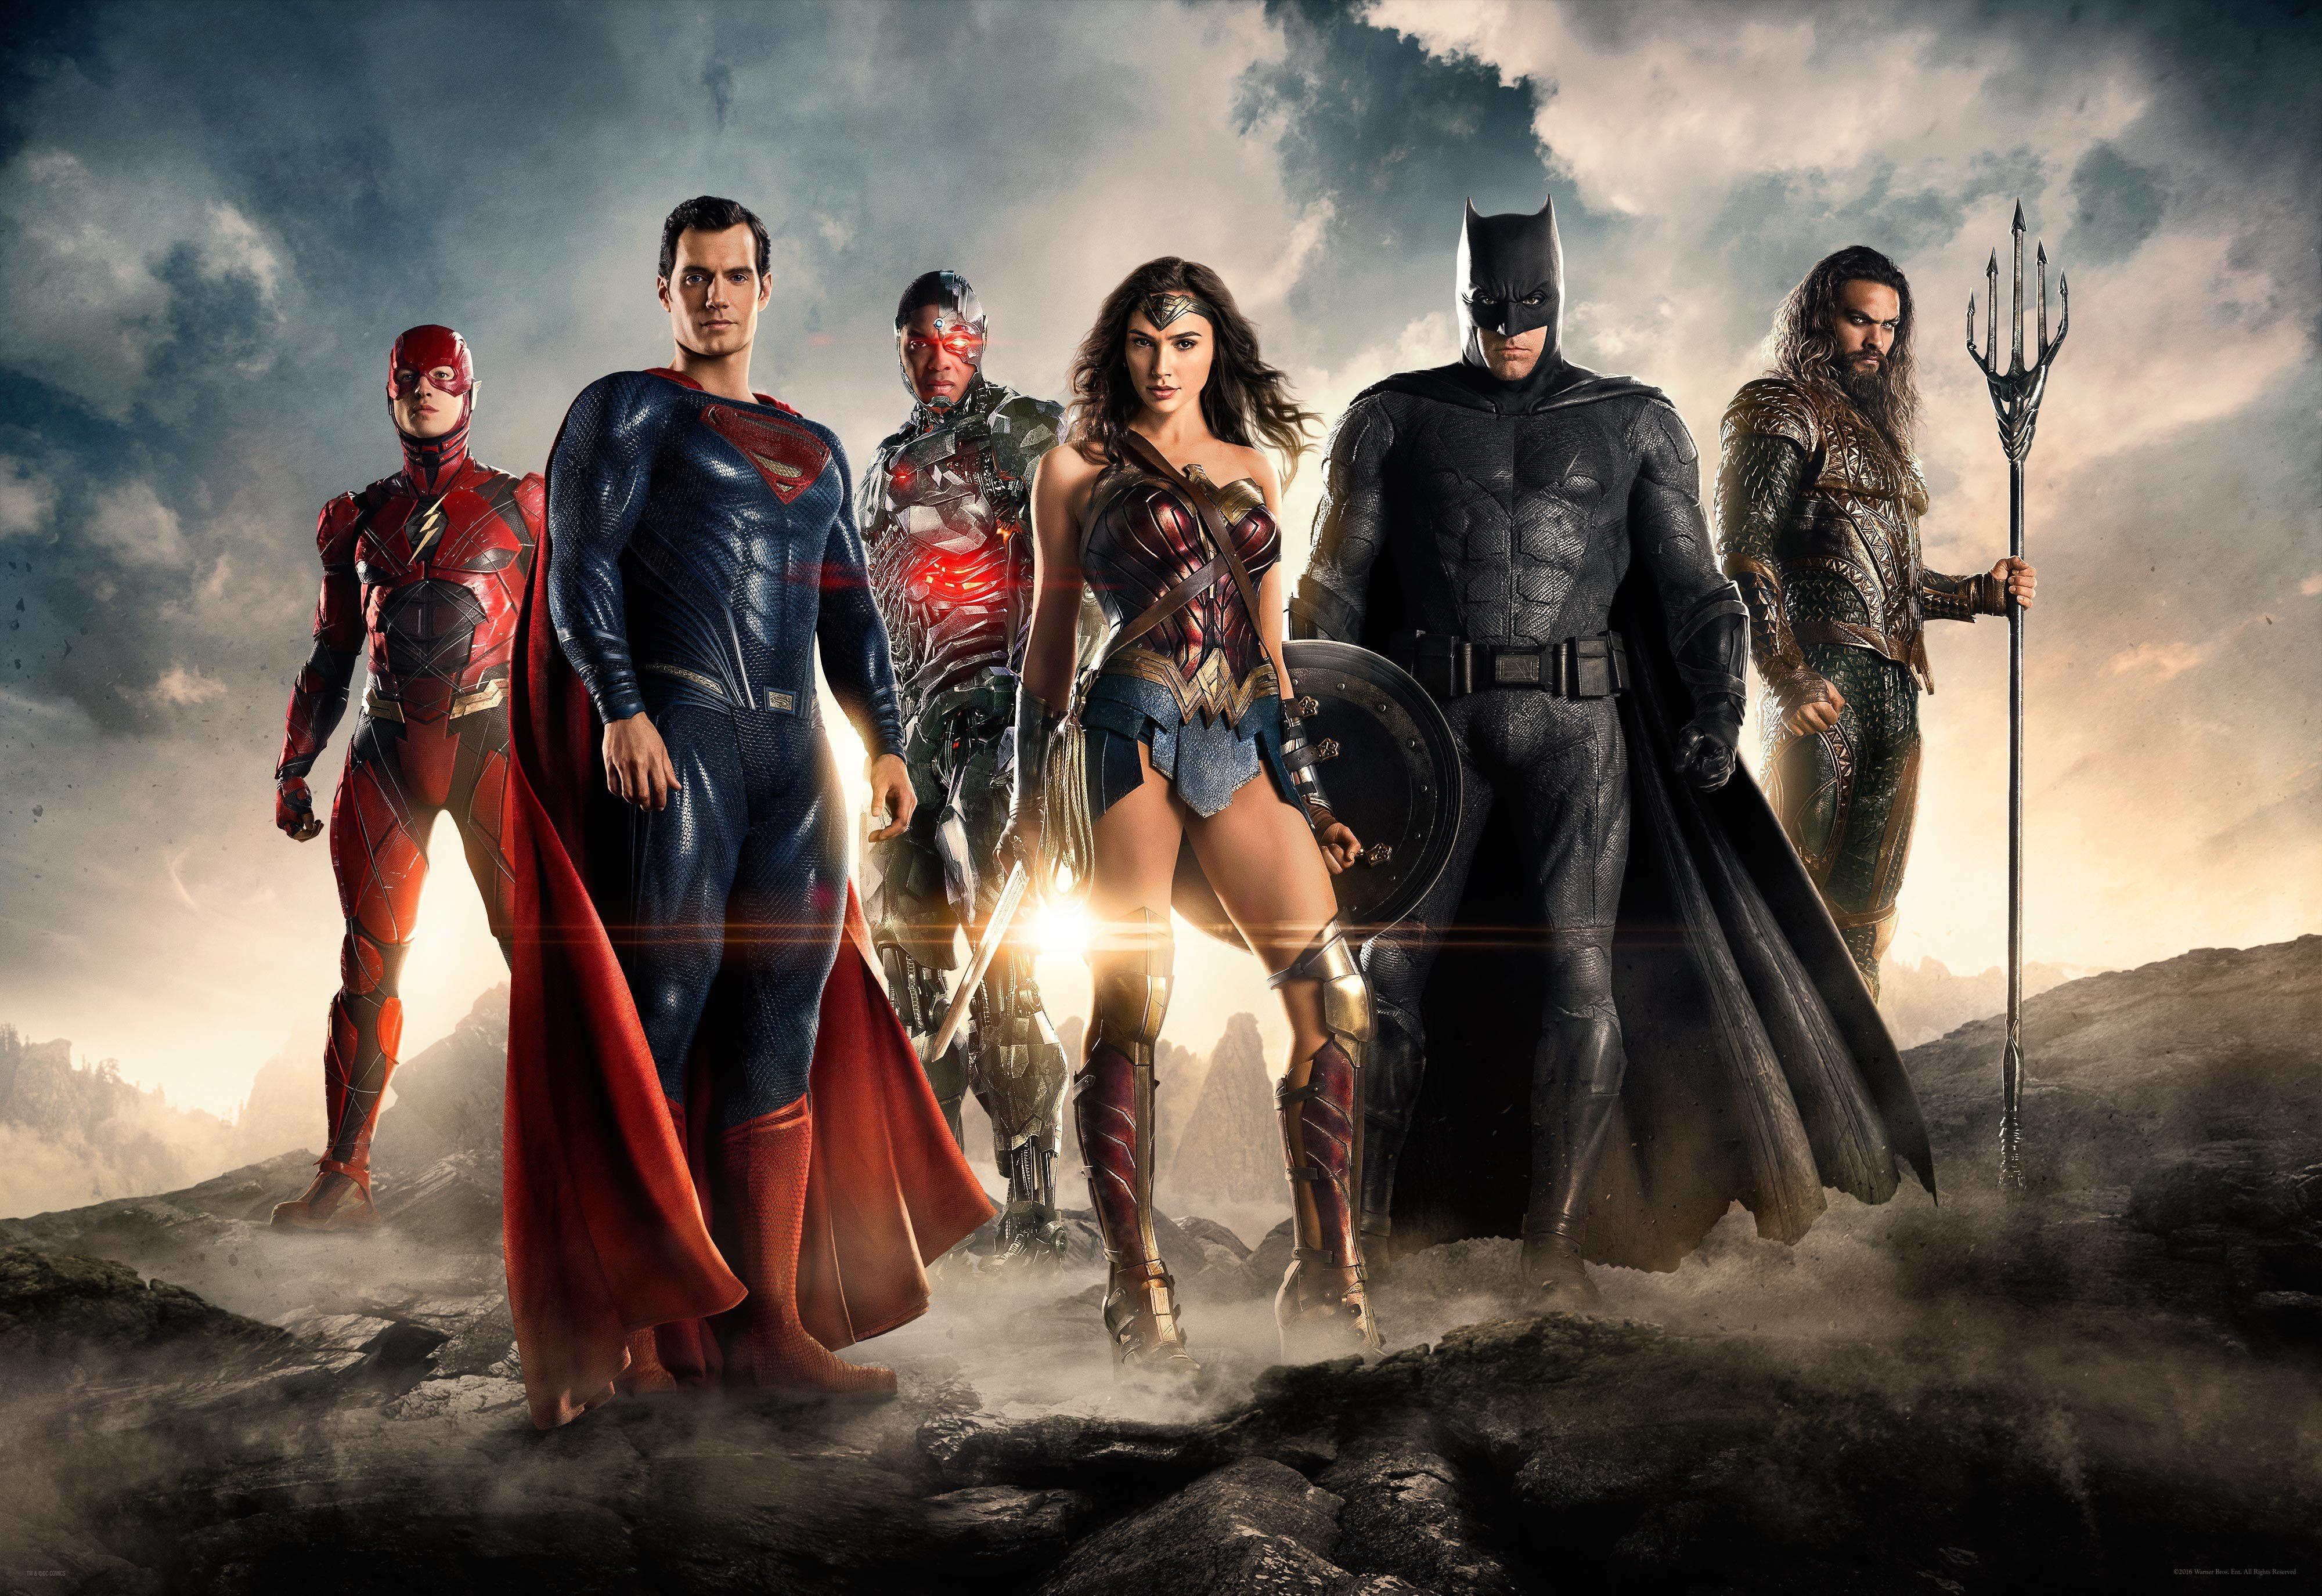 Flash Ezra Miller Superman Henry Cavill Cyborg DC Comics Ray Fisher Wonder Woman Gal Gadot Batman Be 4000x2750